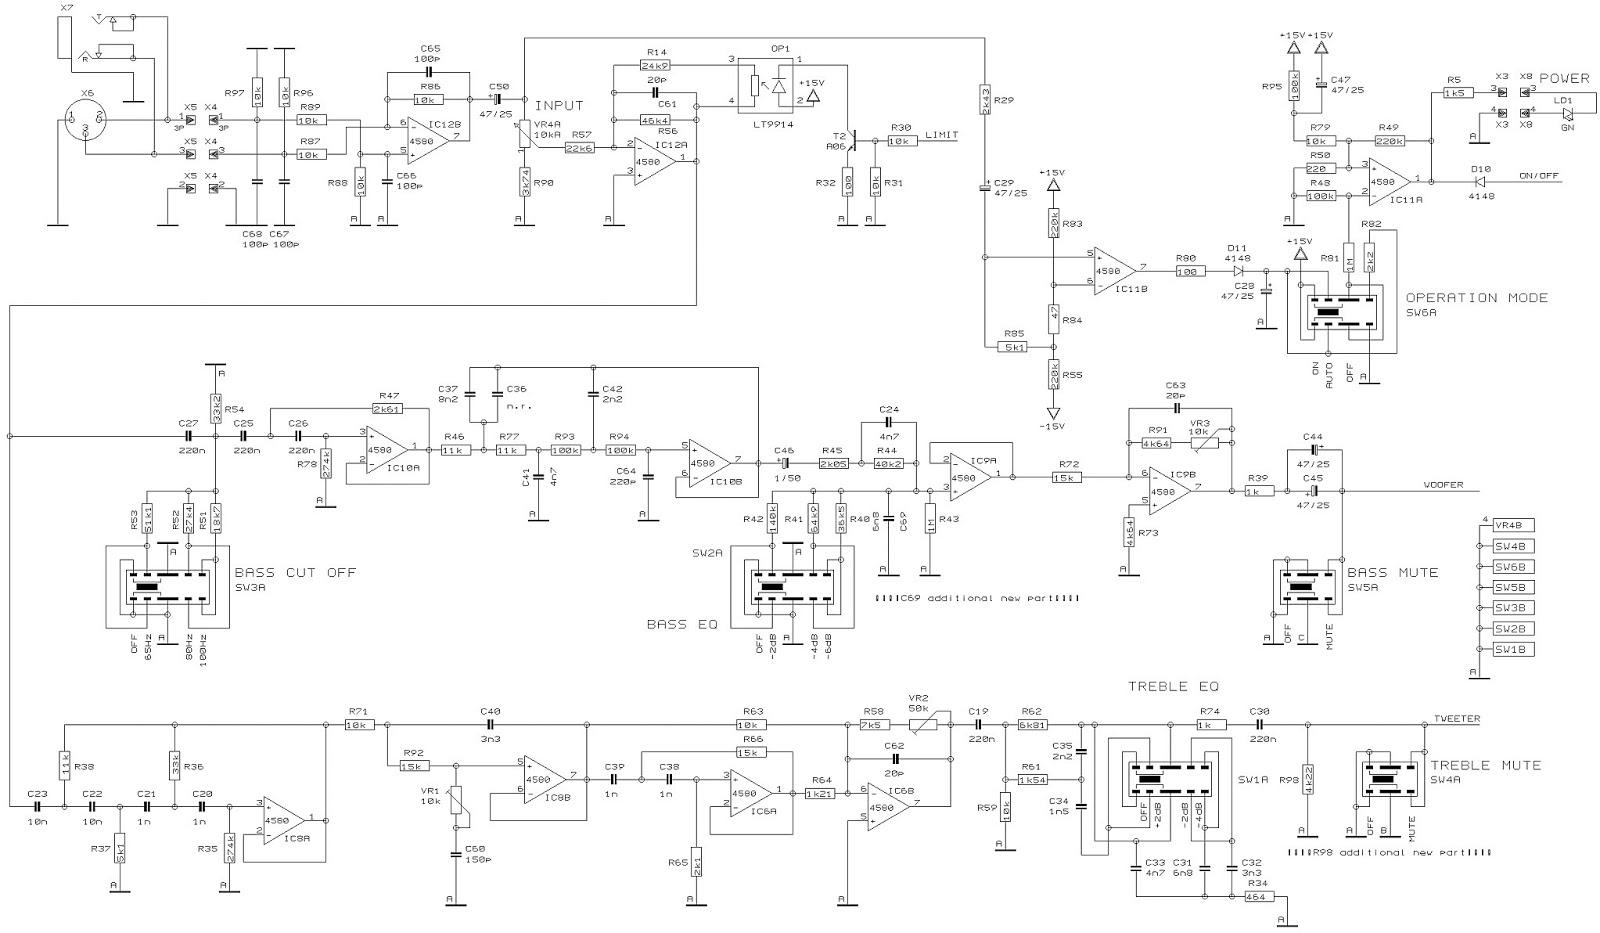 behringer b2031 schematic active 2 way reference studio monitor rh schematicscom blogspot com Cat 5 Wiring Diagram Cat 5 Crossover Cable Diagram